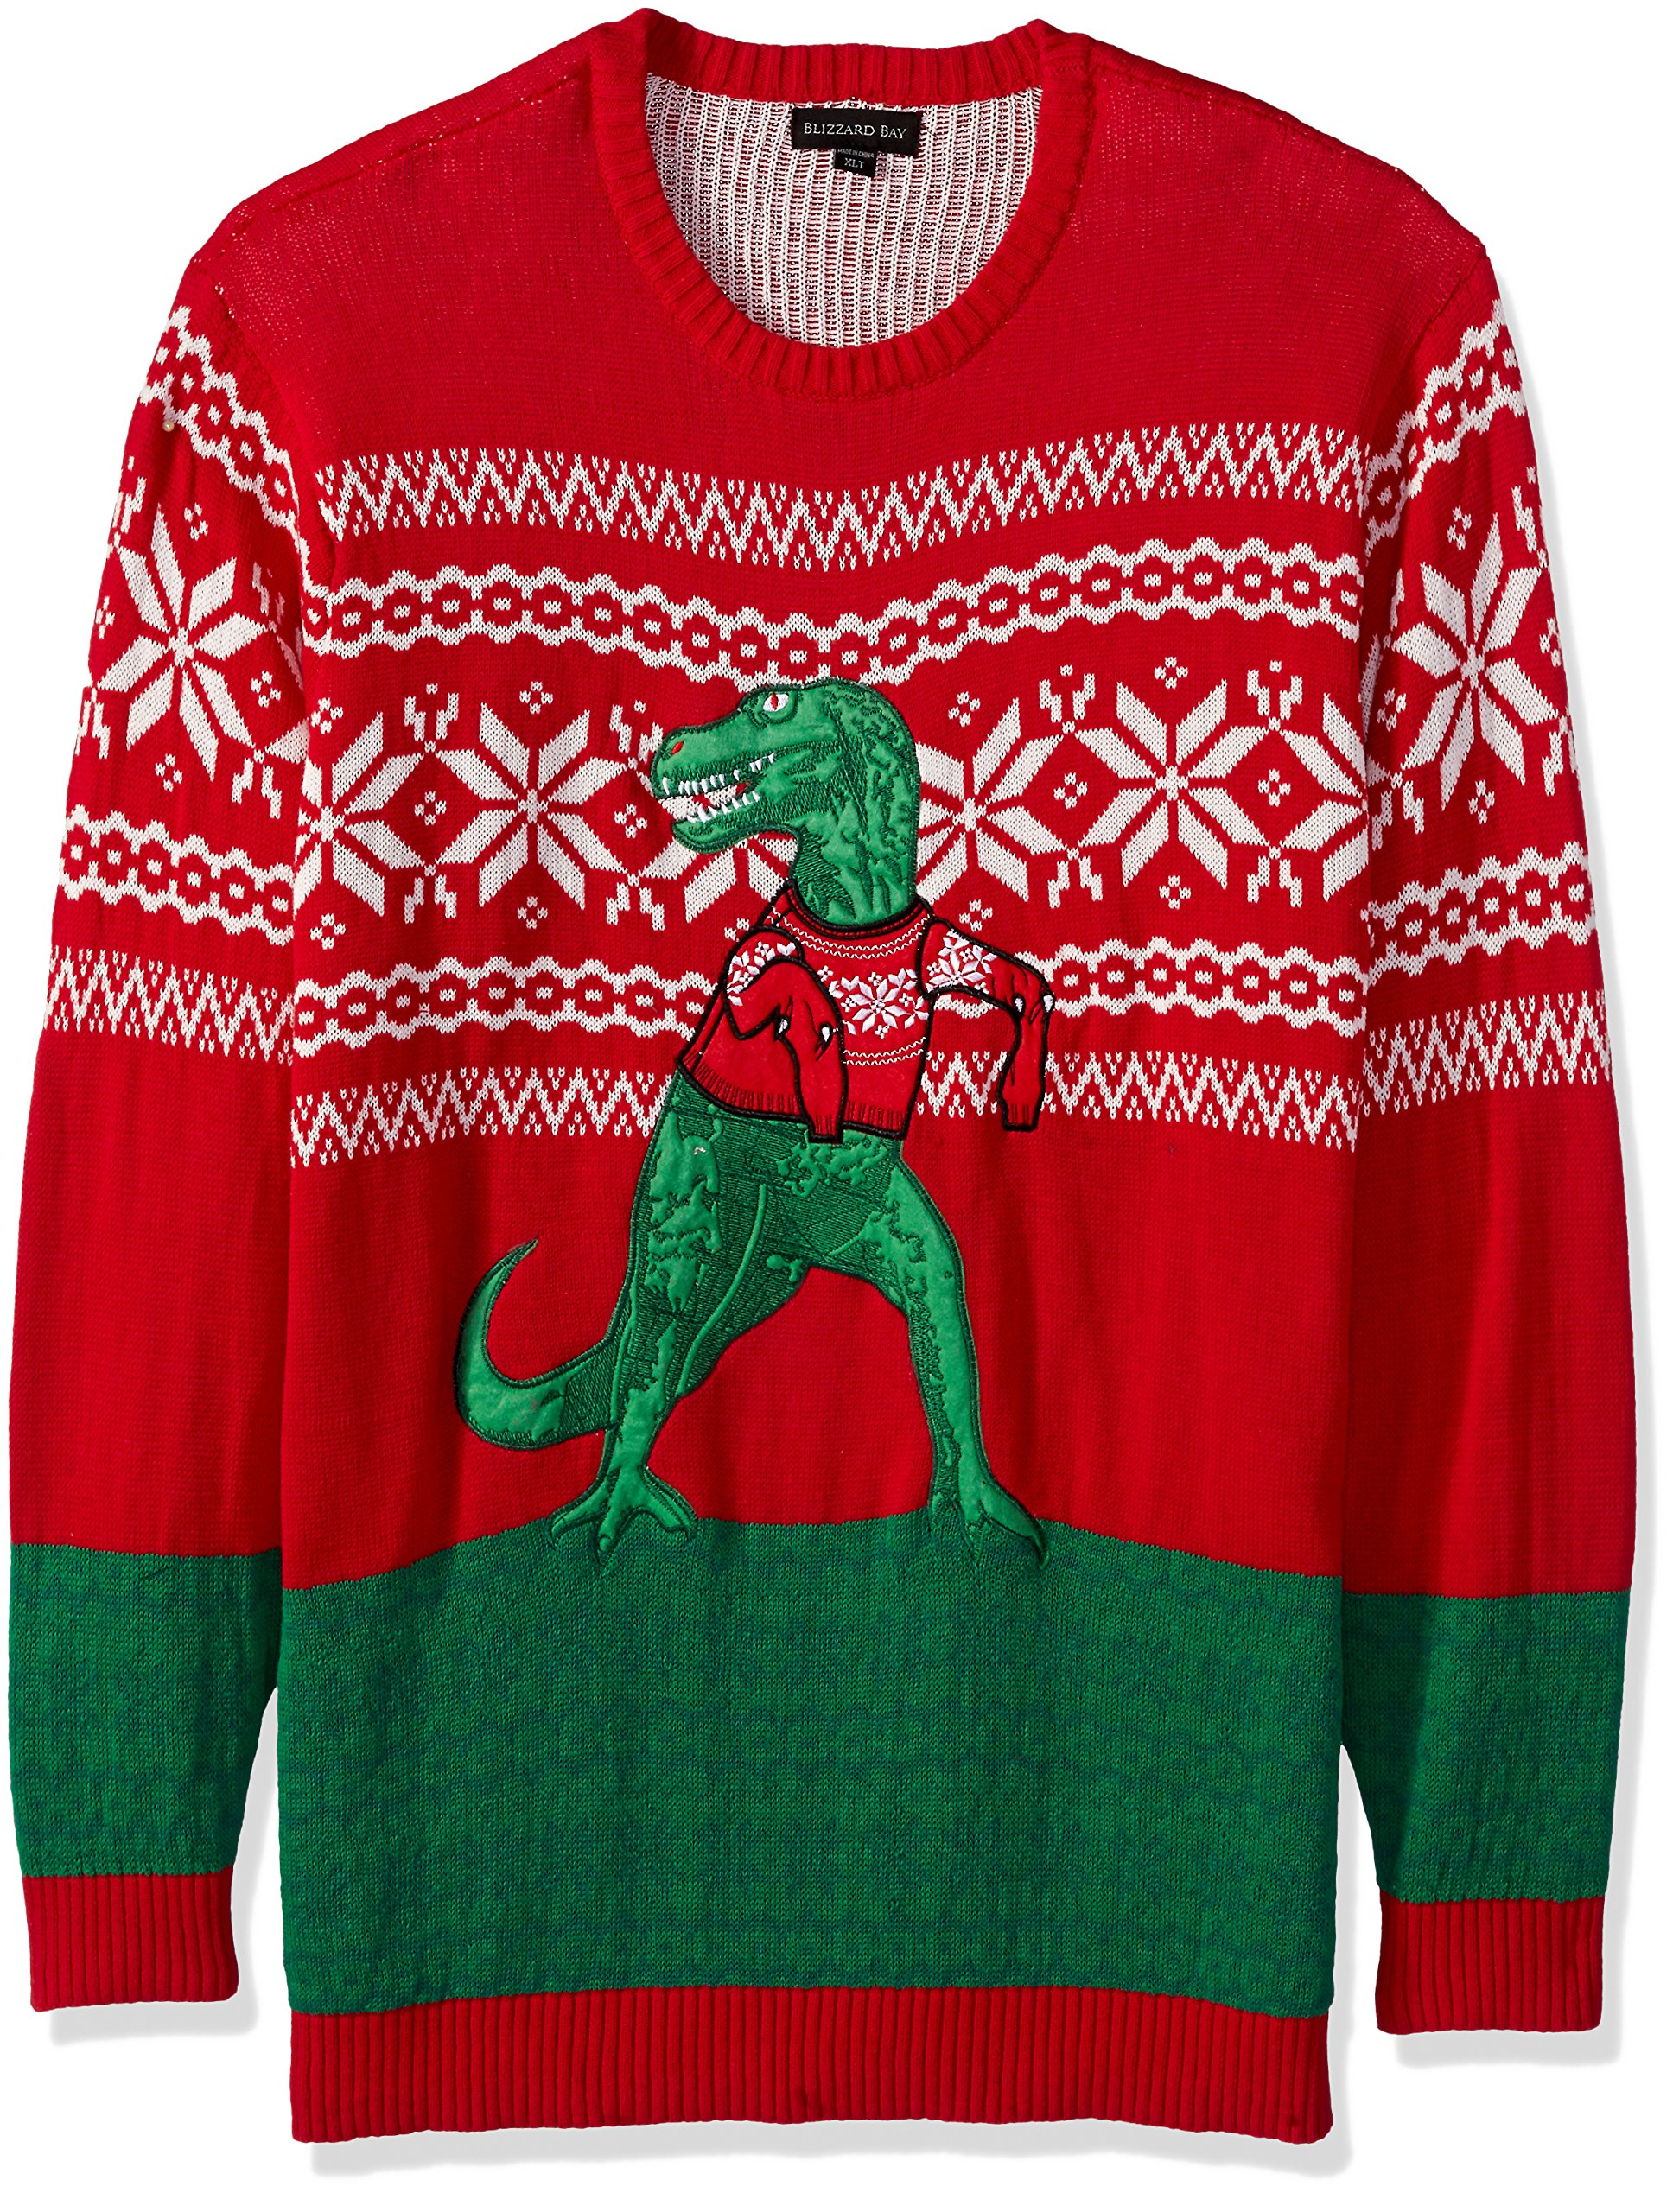 Big Ugly Christmas Sweater: Amazon.com